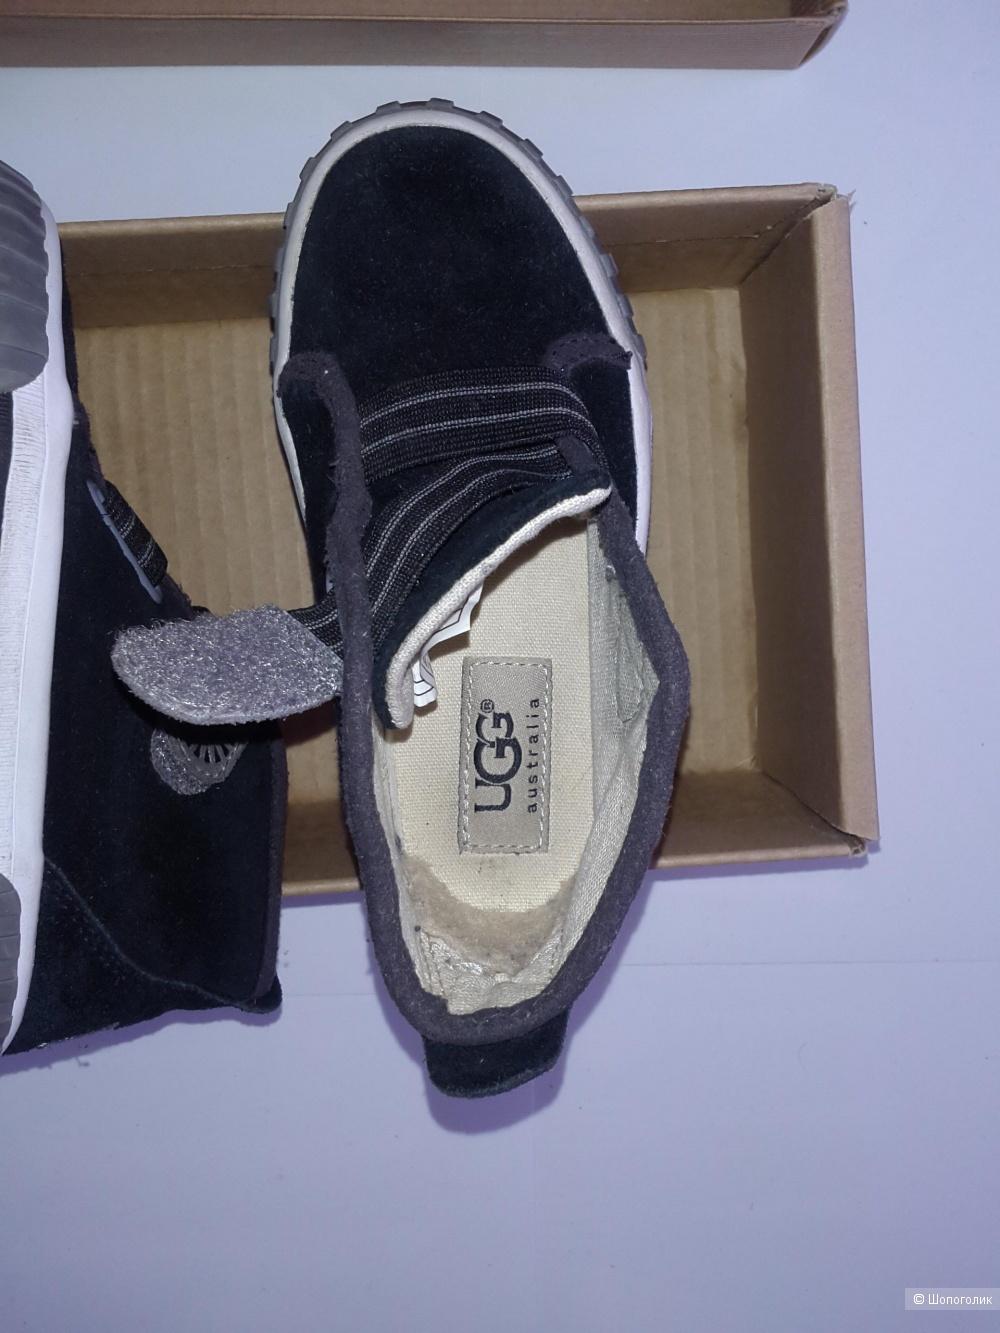 Ugg ботинки  детские размер 25